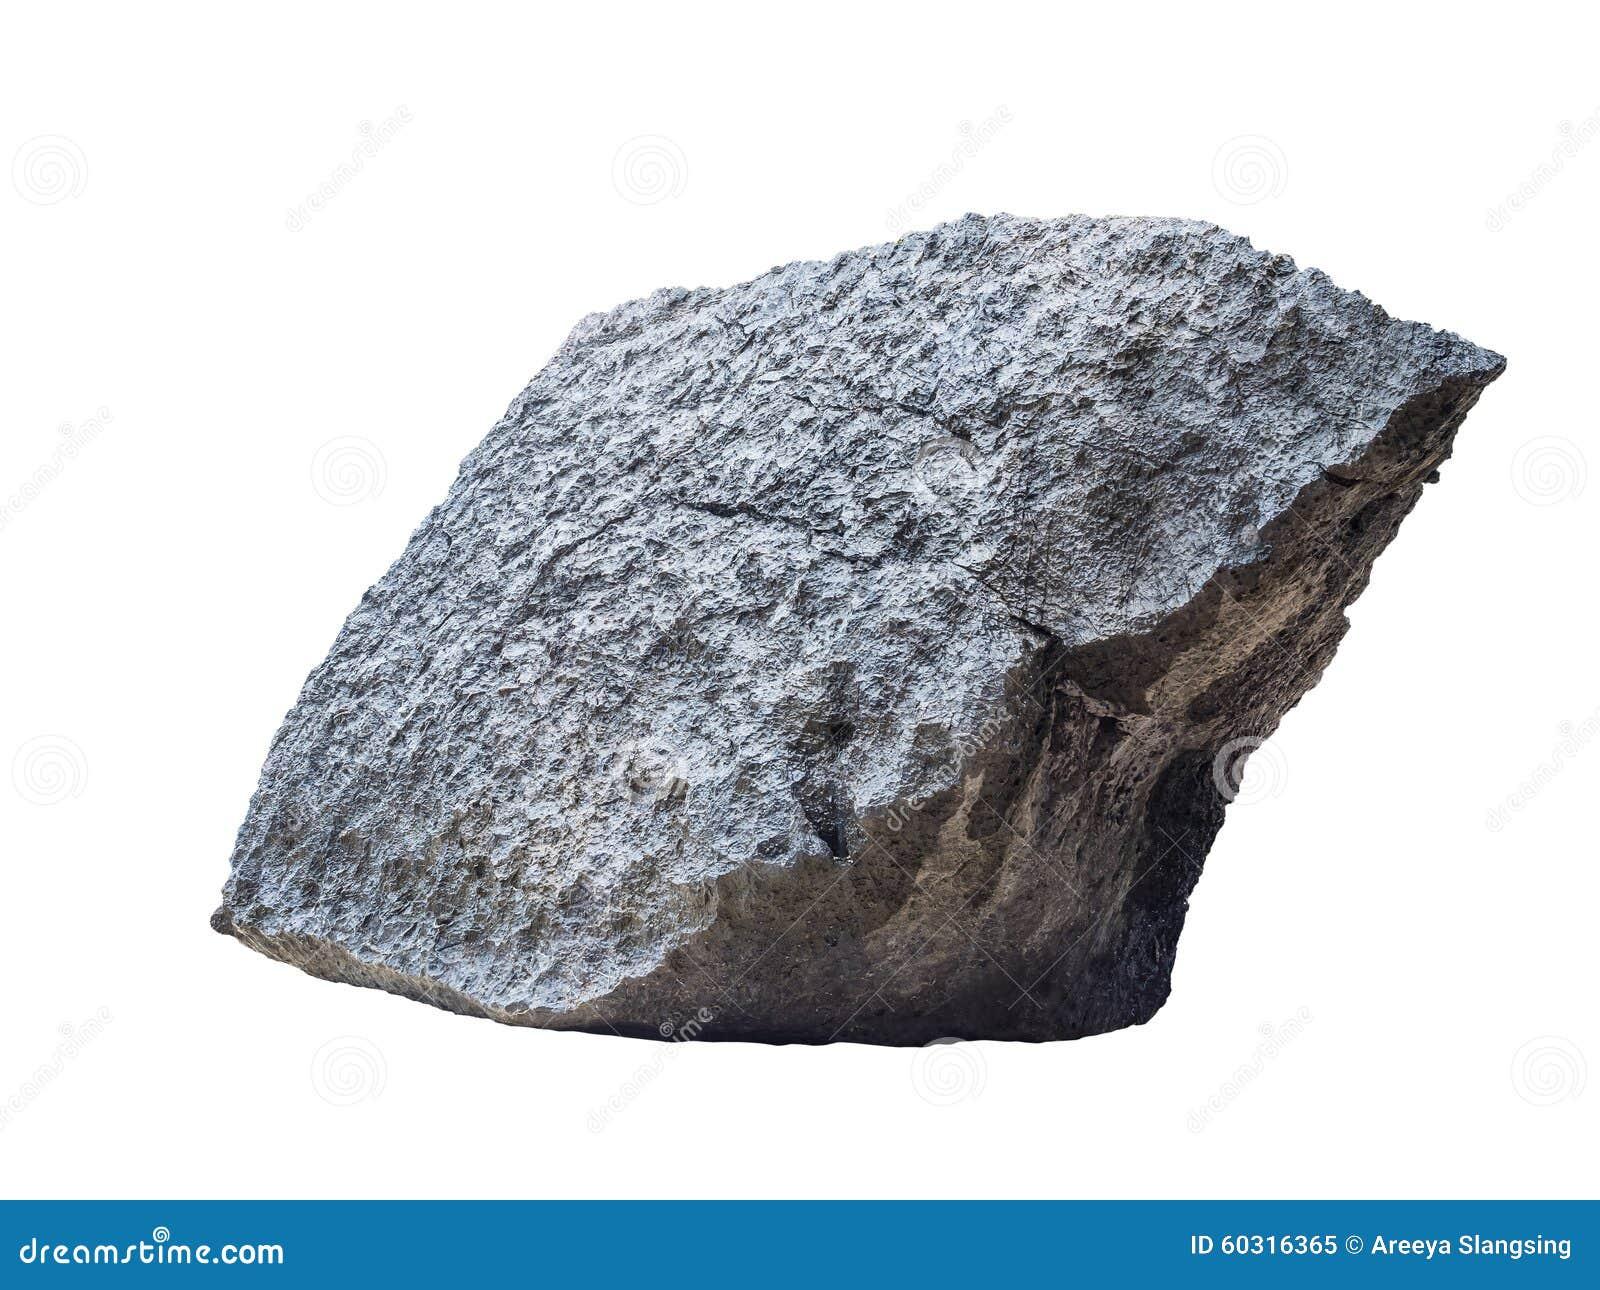 Large White Granite Rock : Big granite rock stone isolated on white stock photo